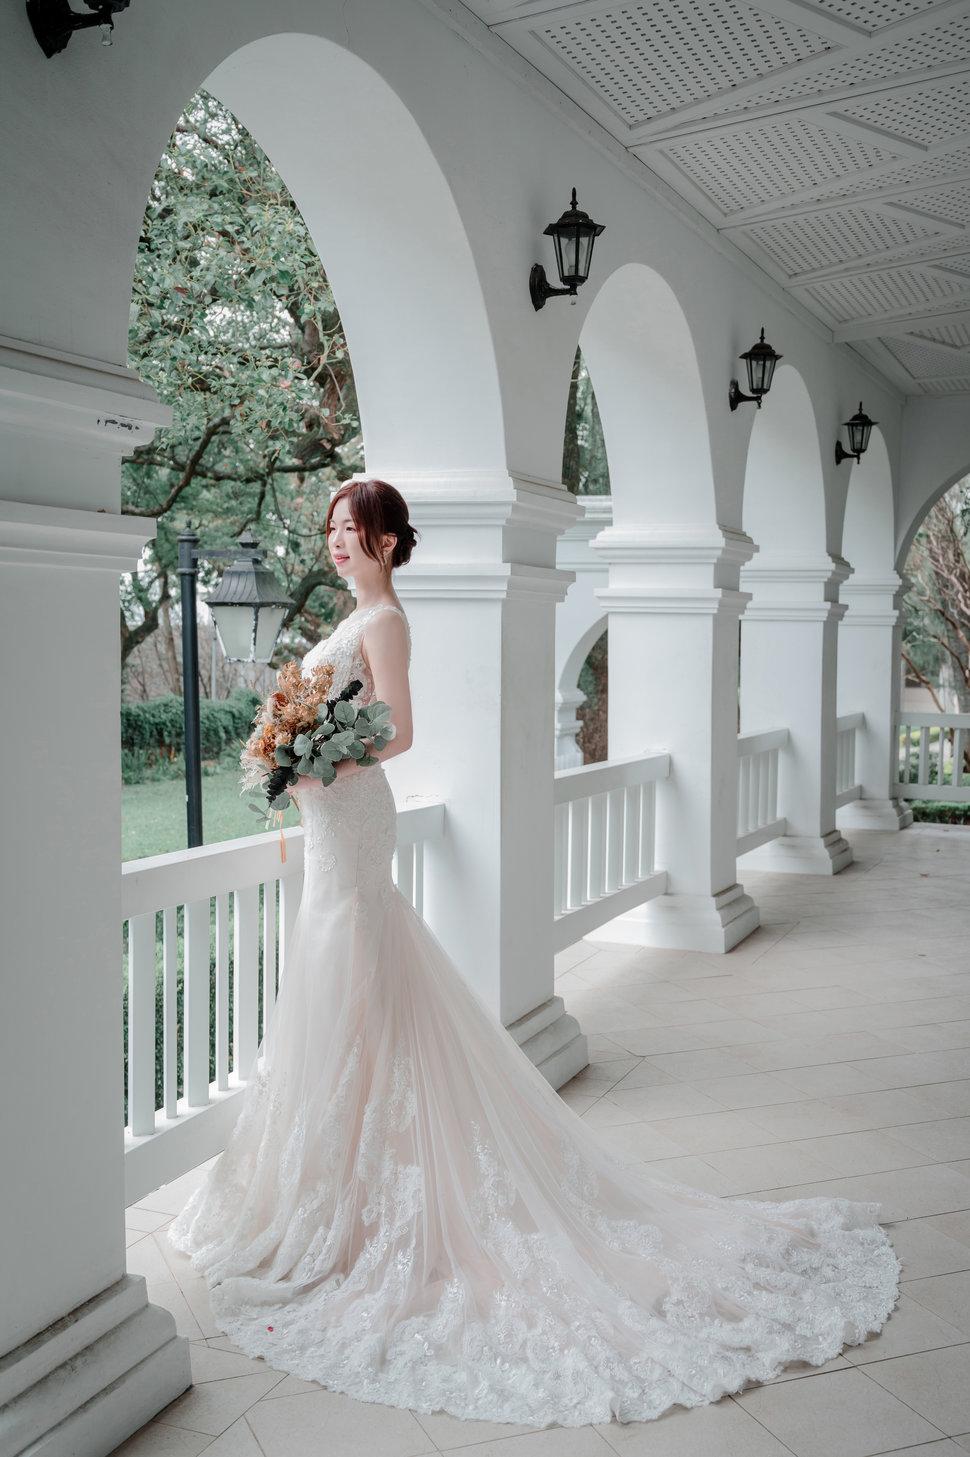 20200111-YEU_5581-1 - 花蓮婚紗 - Sposa Bella《結婚吧》